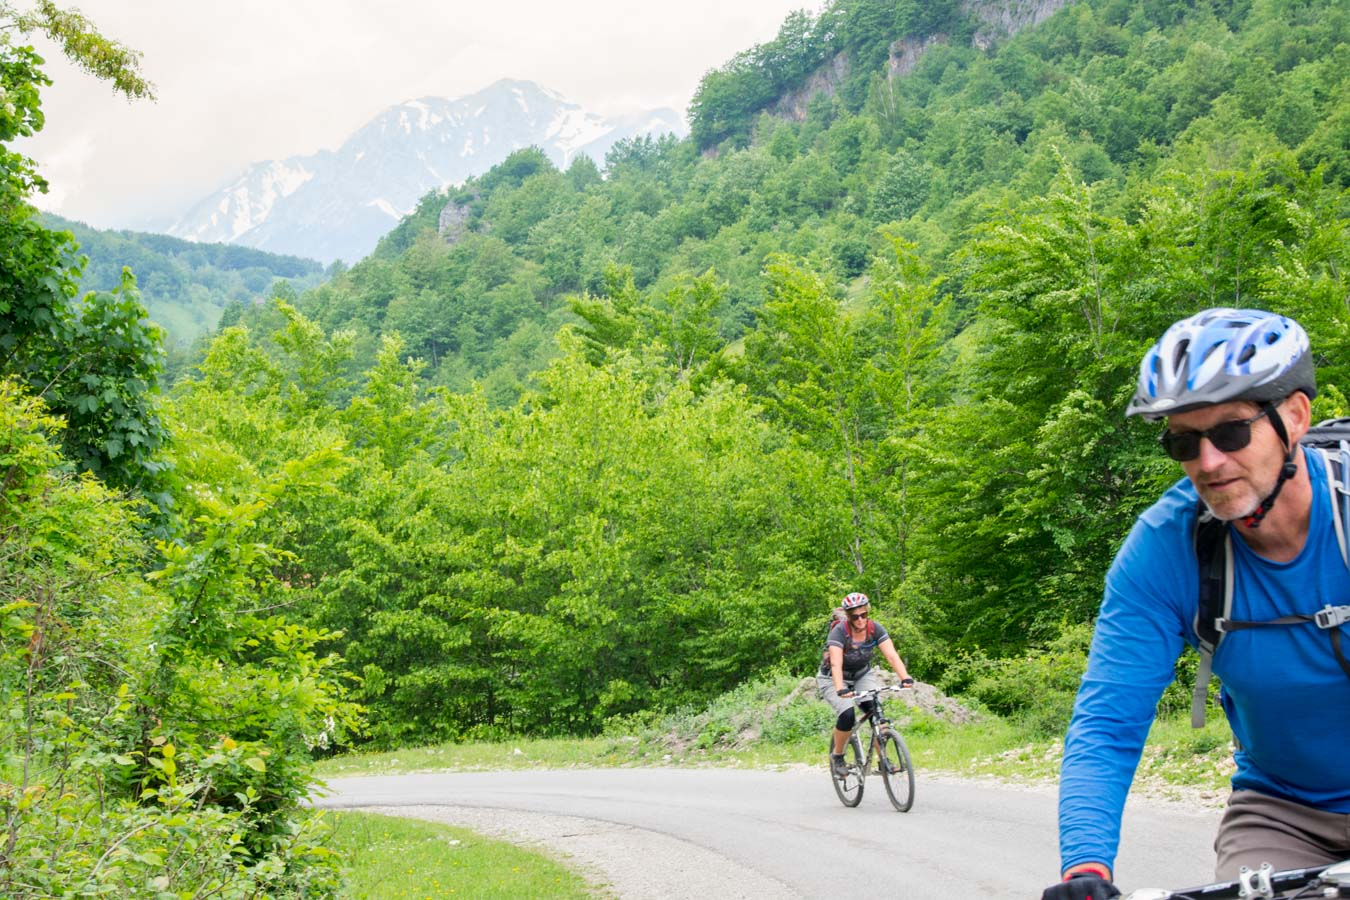 MTB Advventure cycle touring Montenegro - Andrijevica